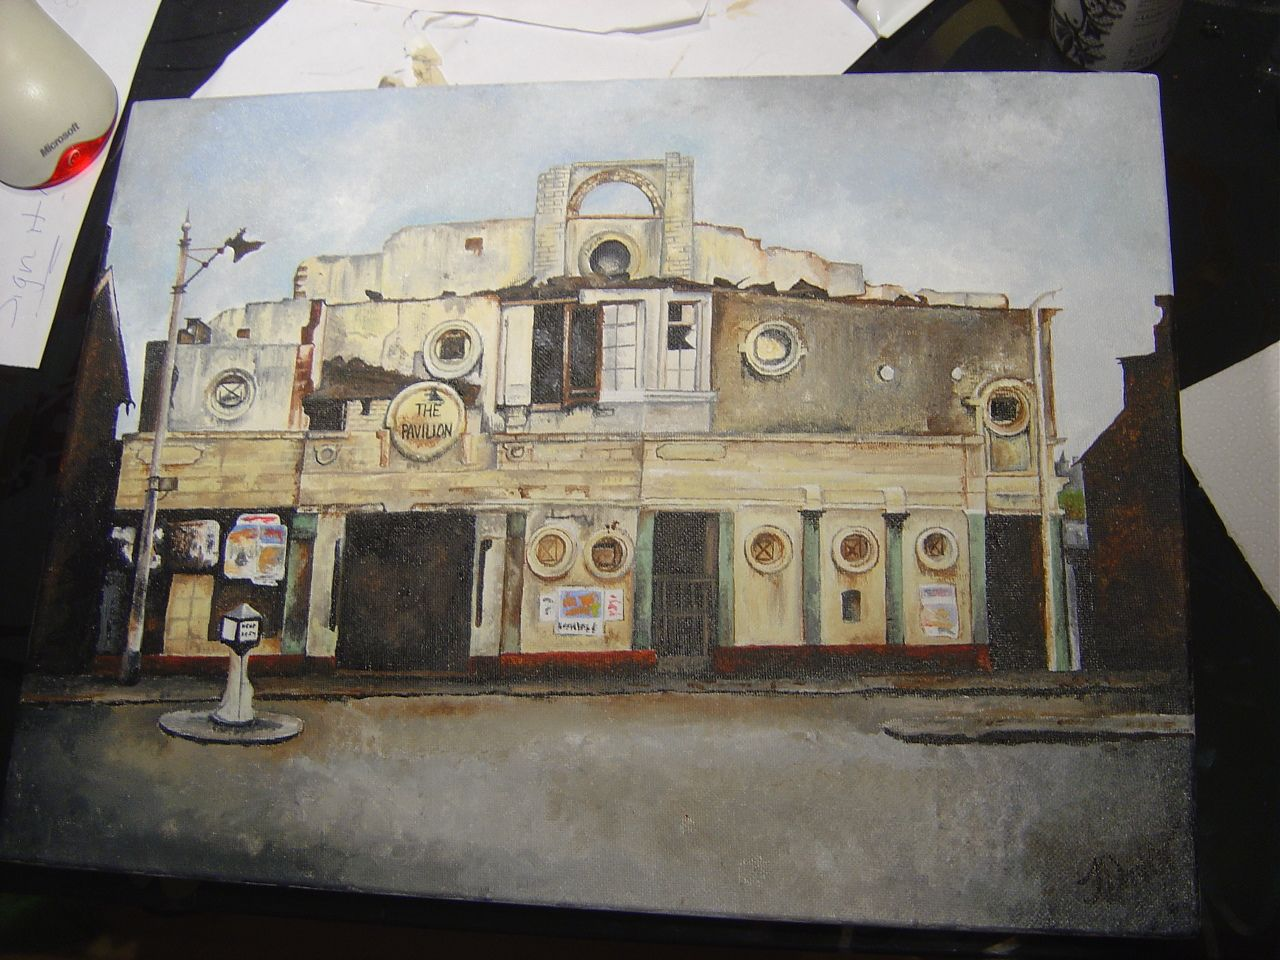 Pavilion Cinema, now demolished